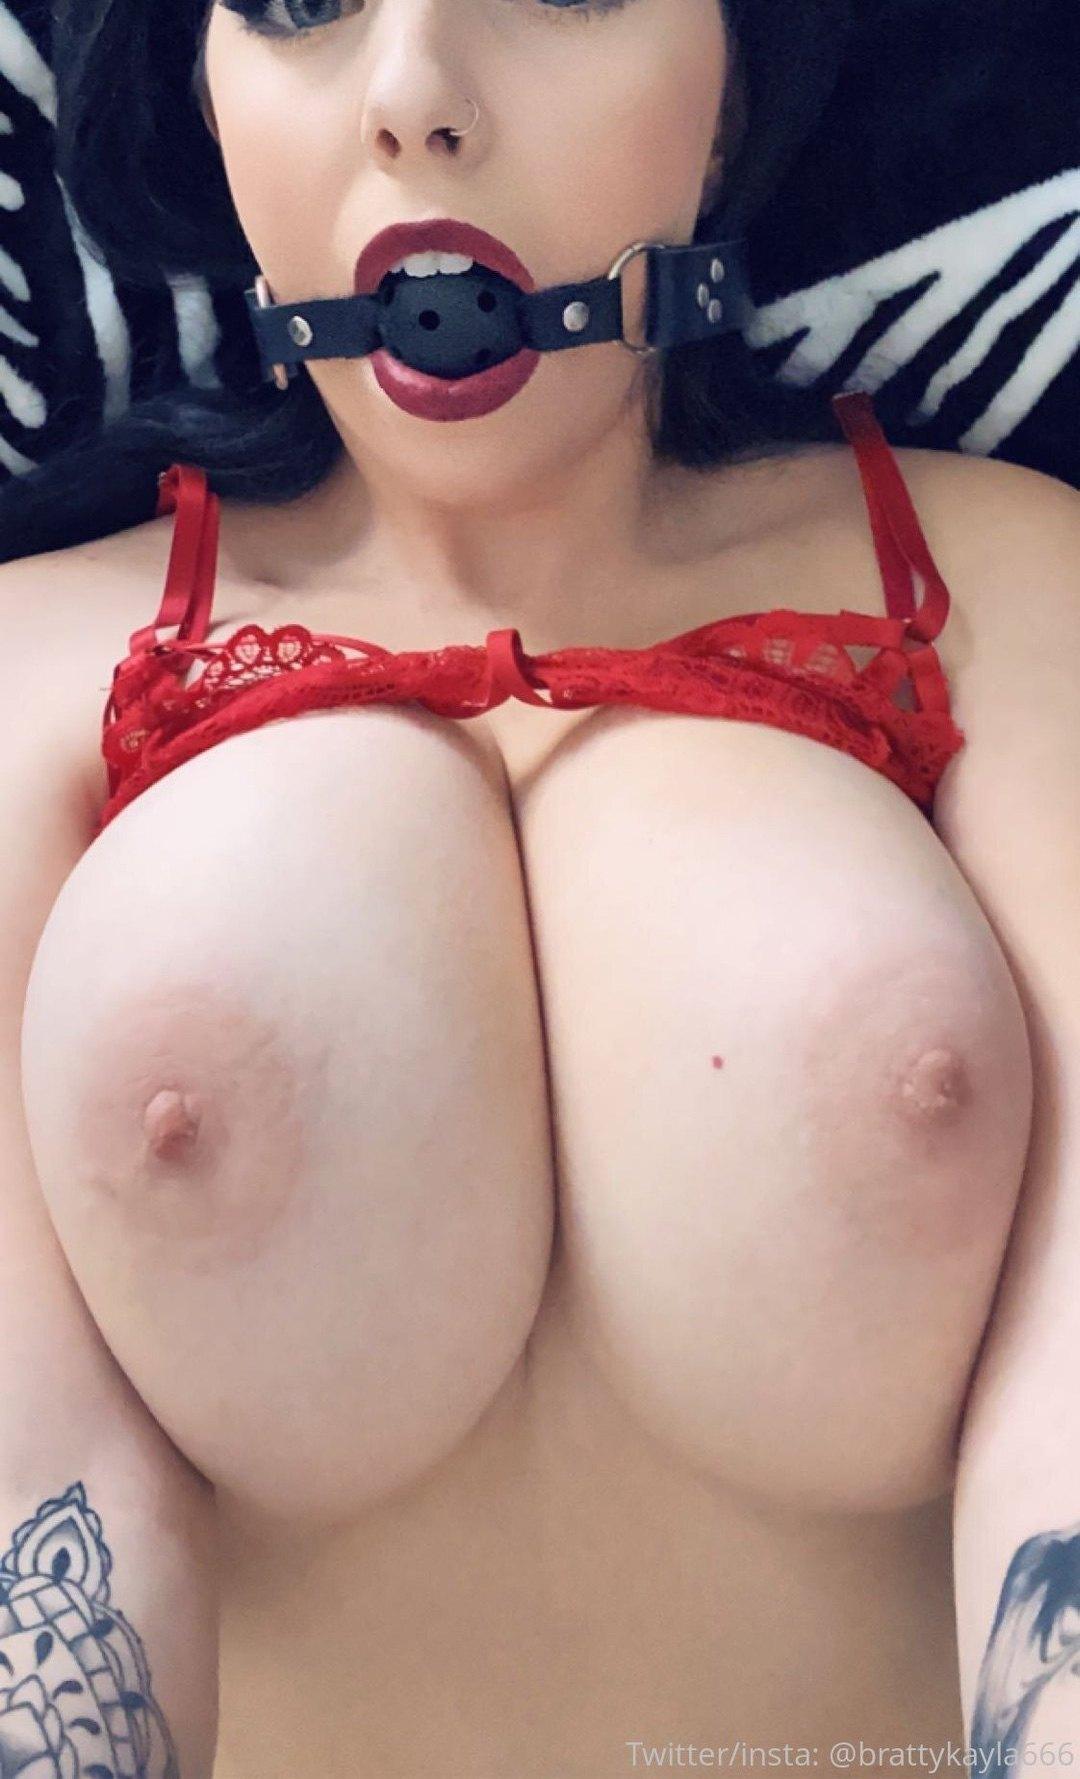 Bratty Kayla Brattykayla666 Onlyfans Nudes Leaks 0004